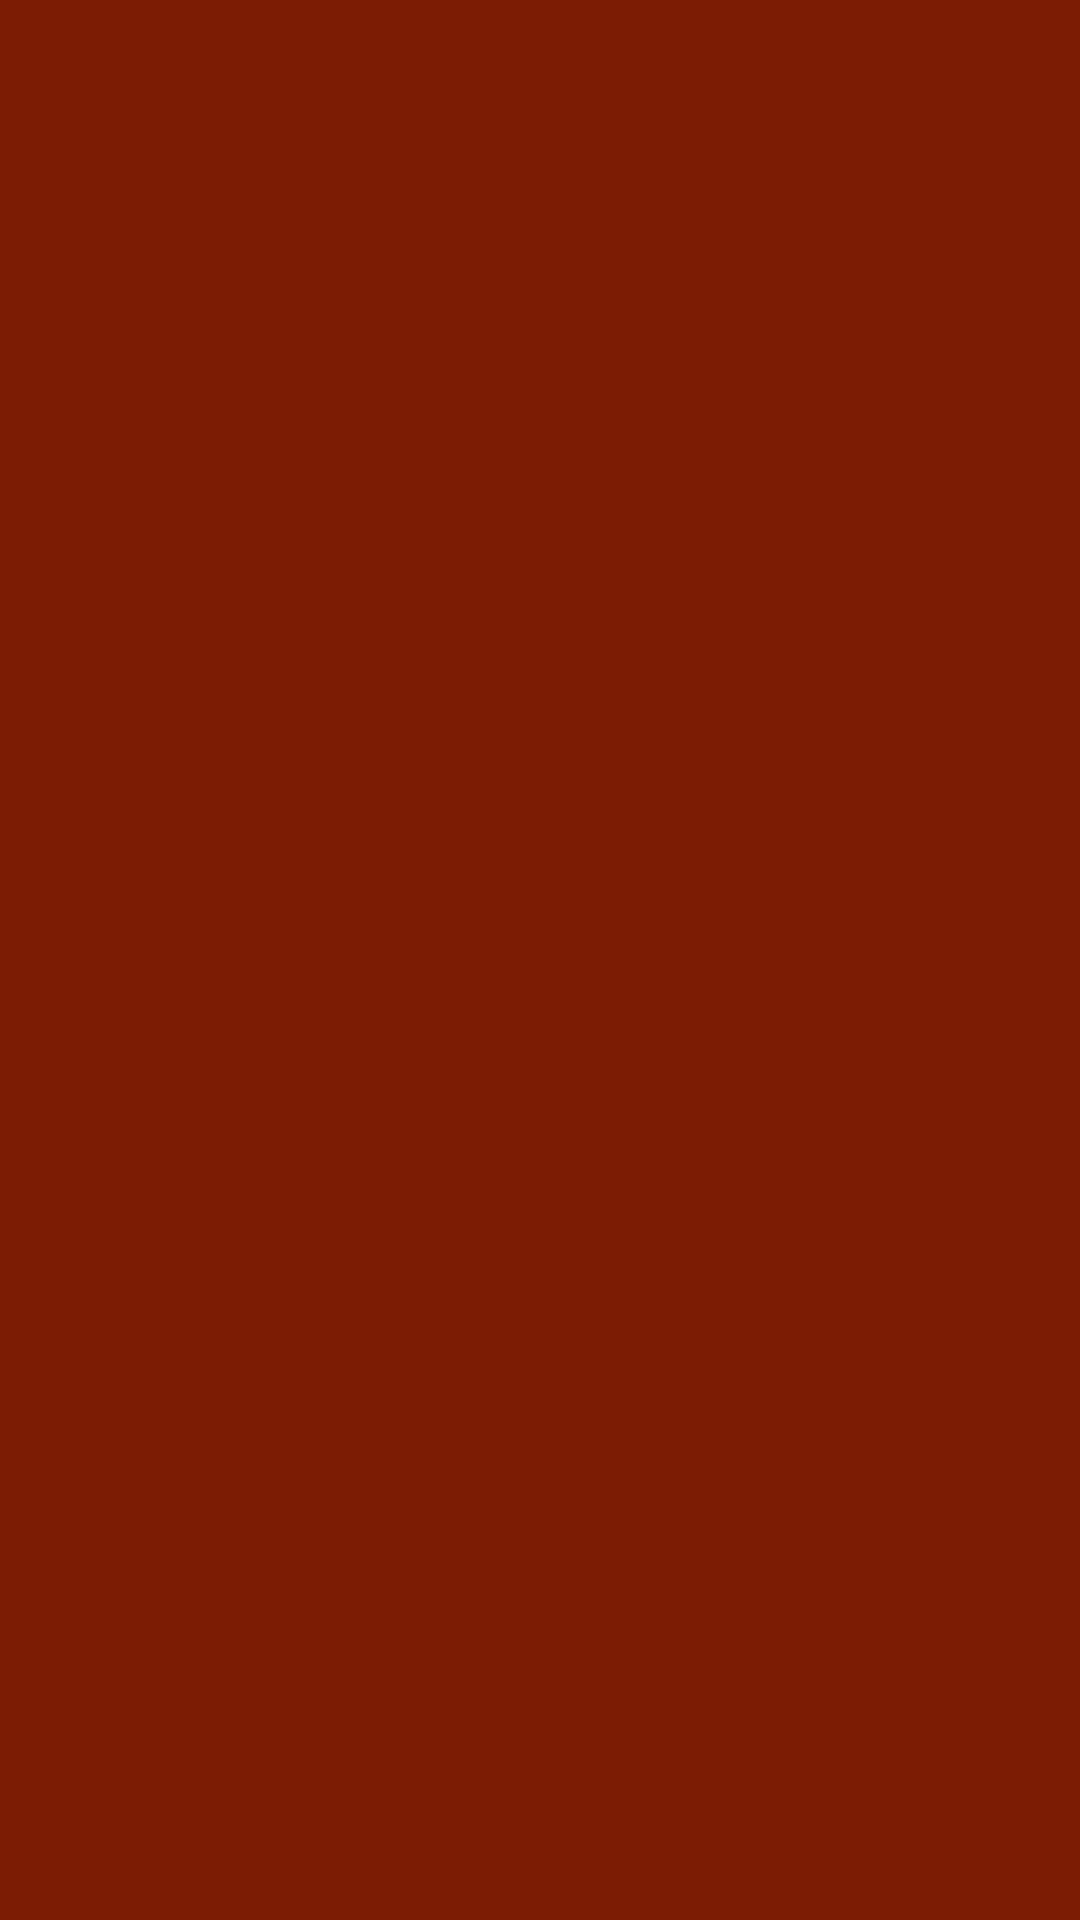 1080x1920 Kenyan Copper Solid Color Background